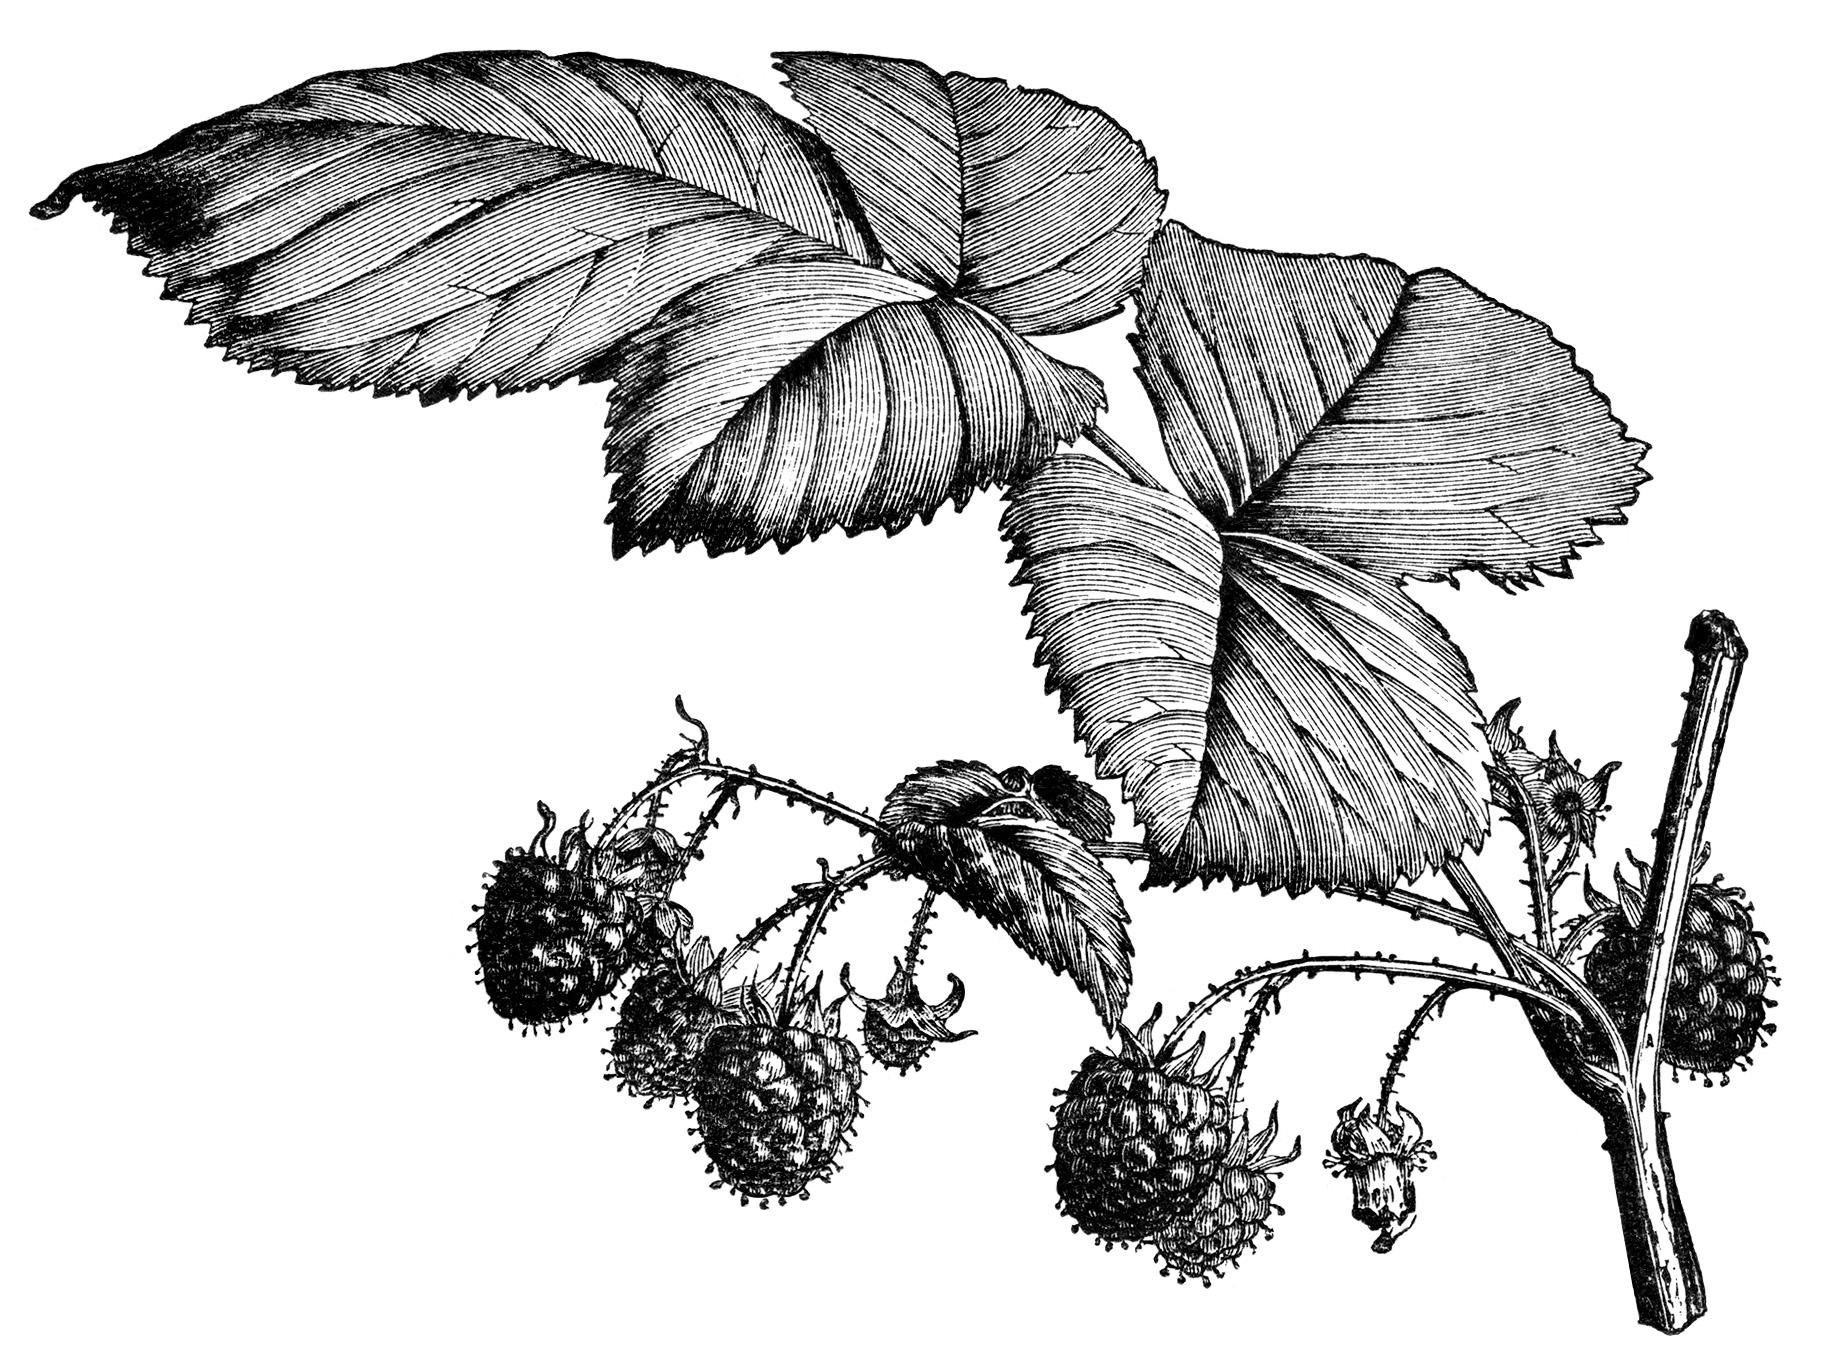 vintage raspberry clip art, old raspberry engraving, black and white clipart, botanical illustration raspberry, ripe raspberries on branch image garden printable